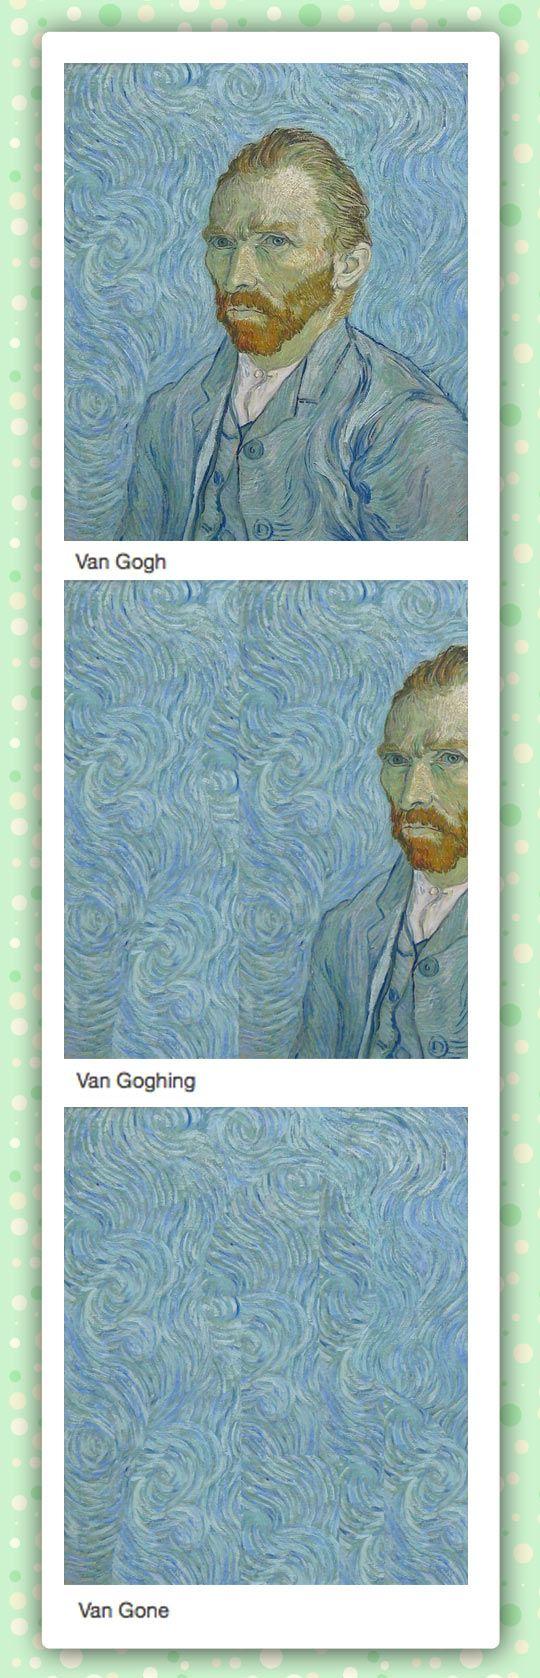 Funny Van Gogh